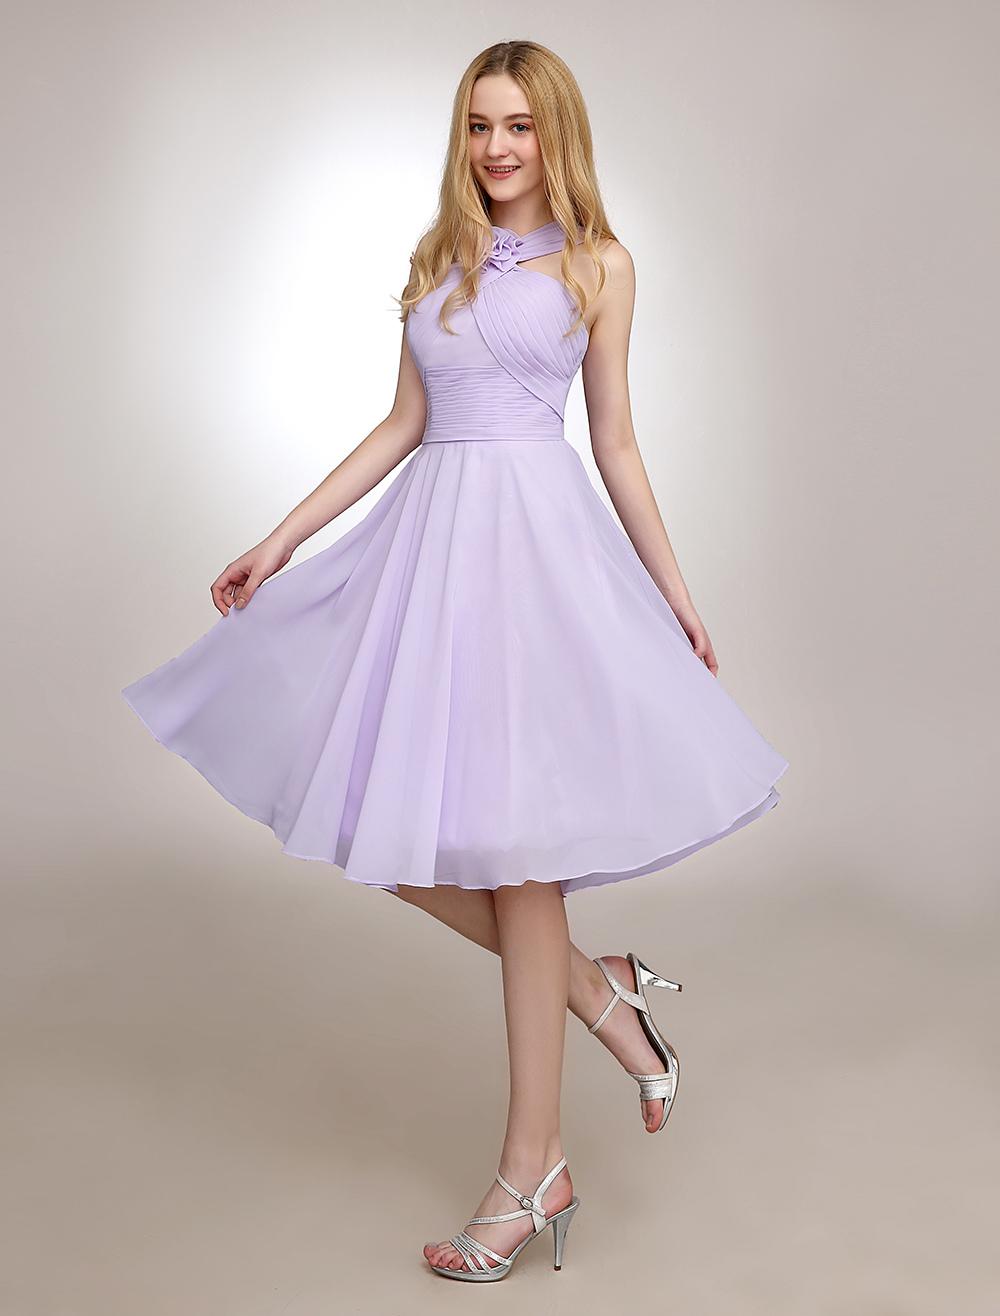 Short Bridesmaid Dress Lilac Halter Pleated Chiffon Wedding Party Dress